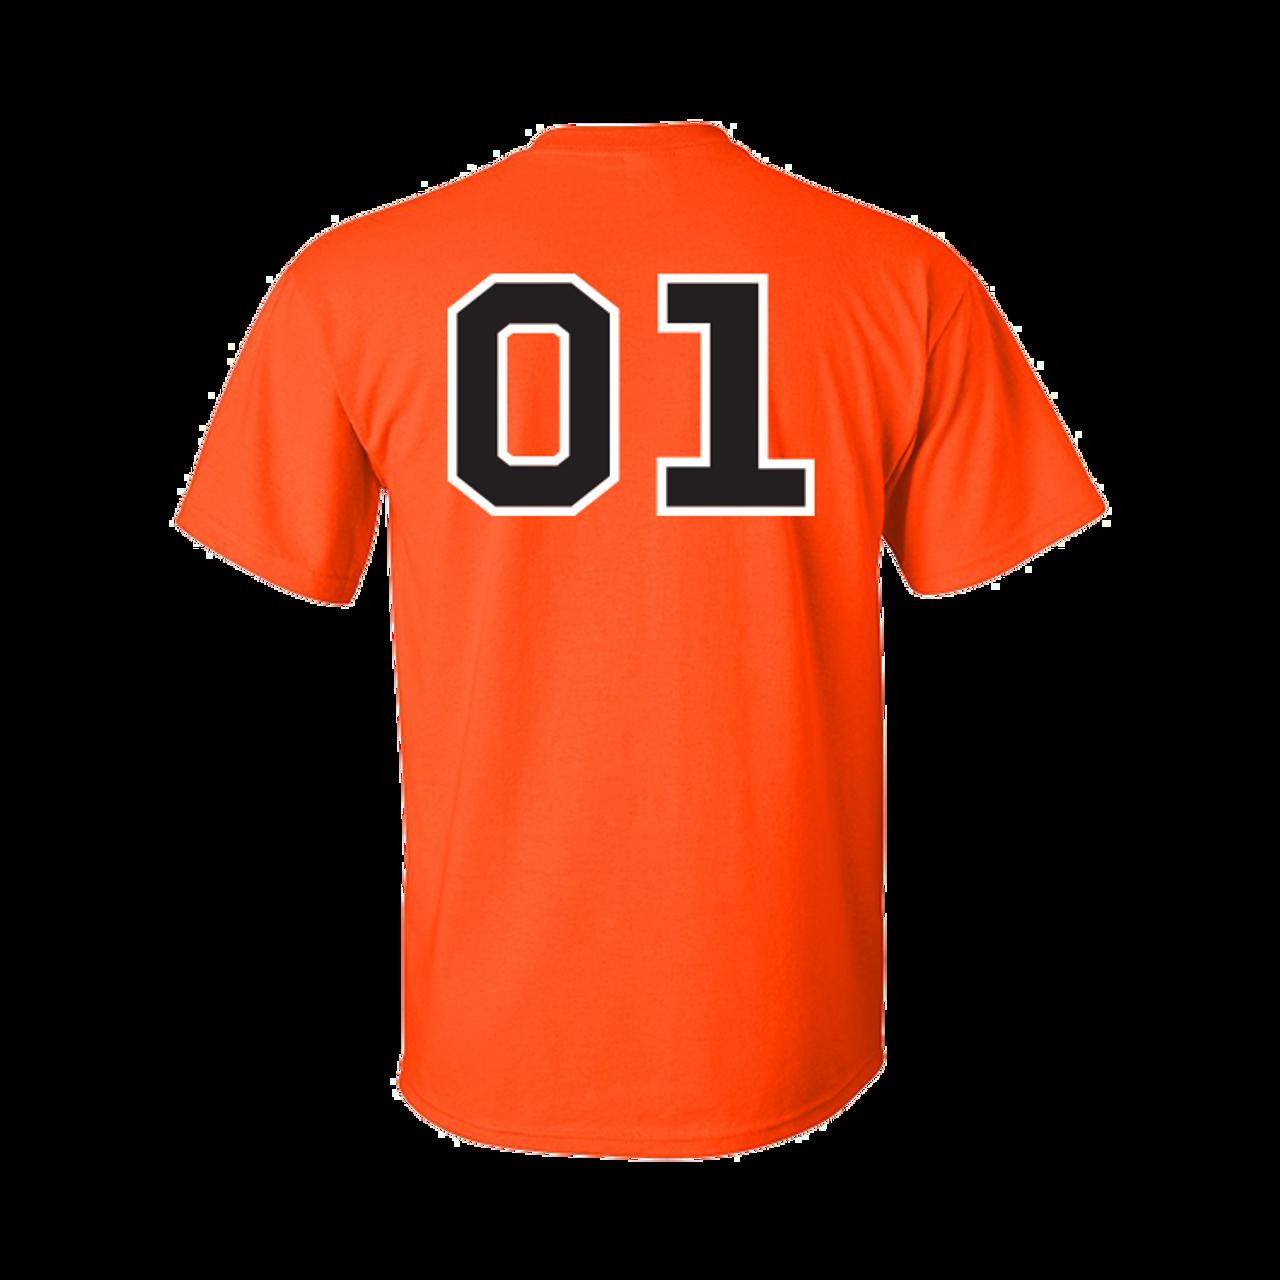 Cooter's Original 01 T-Shirt